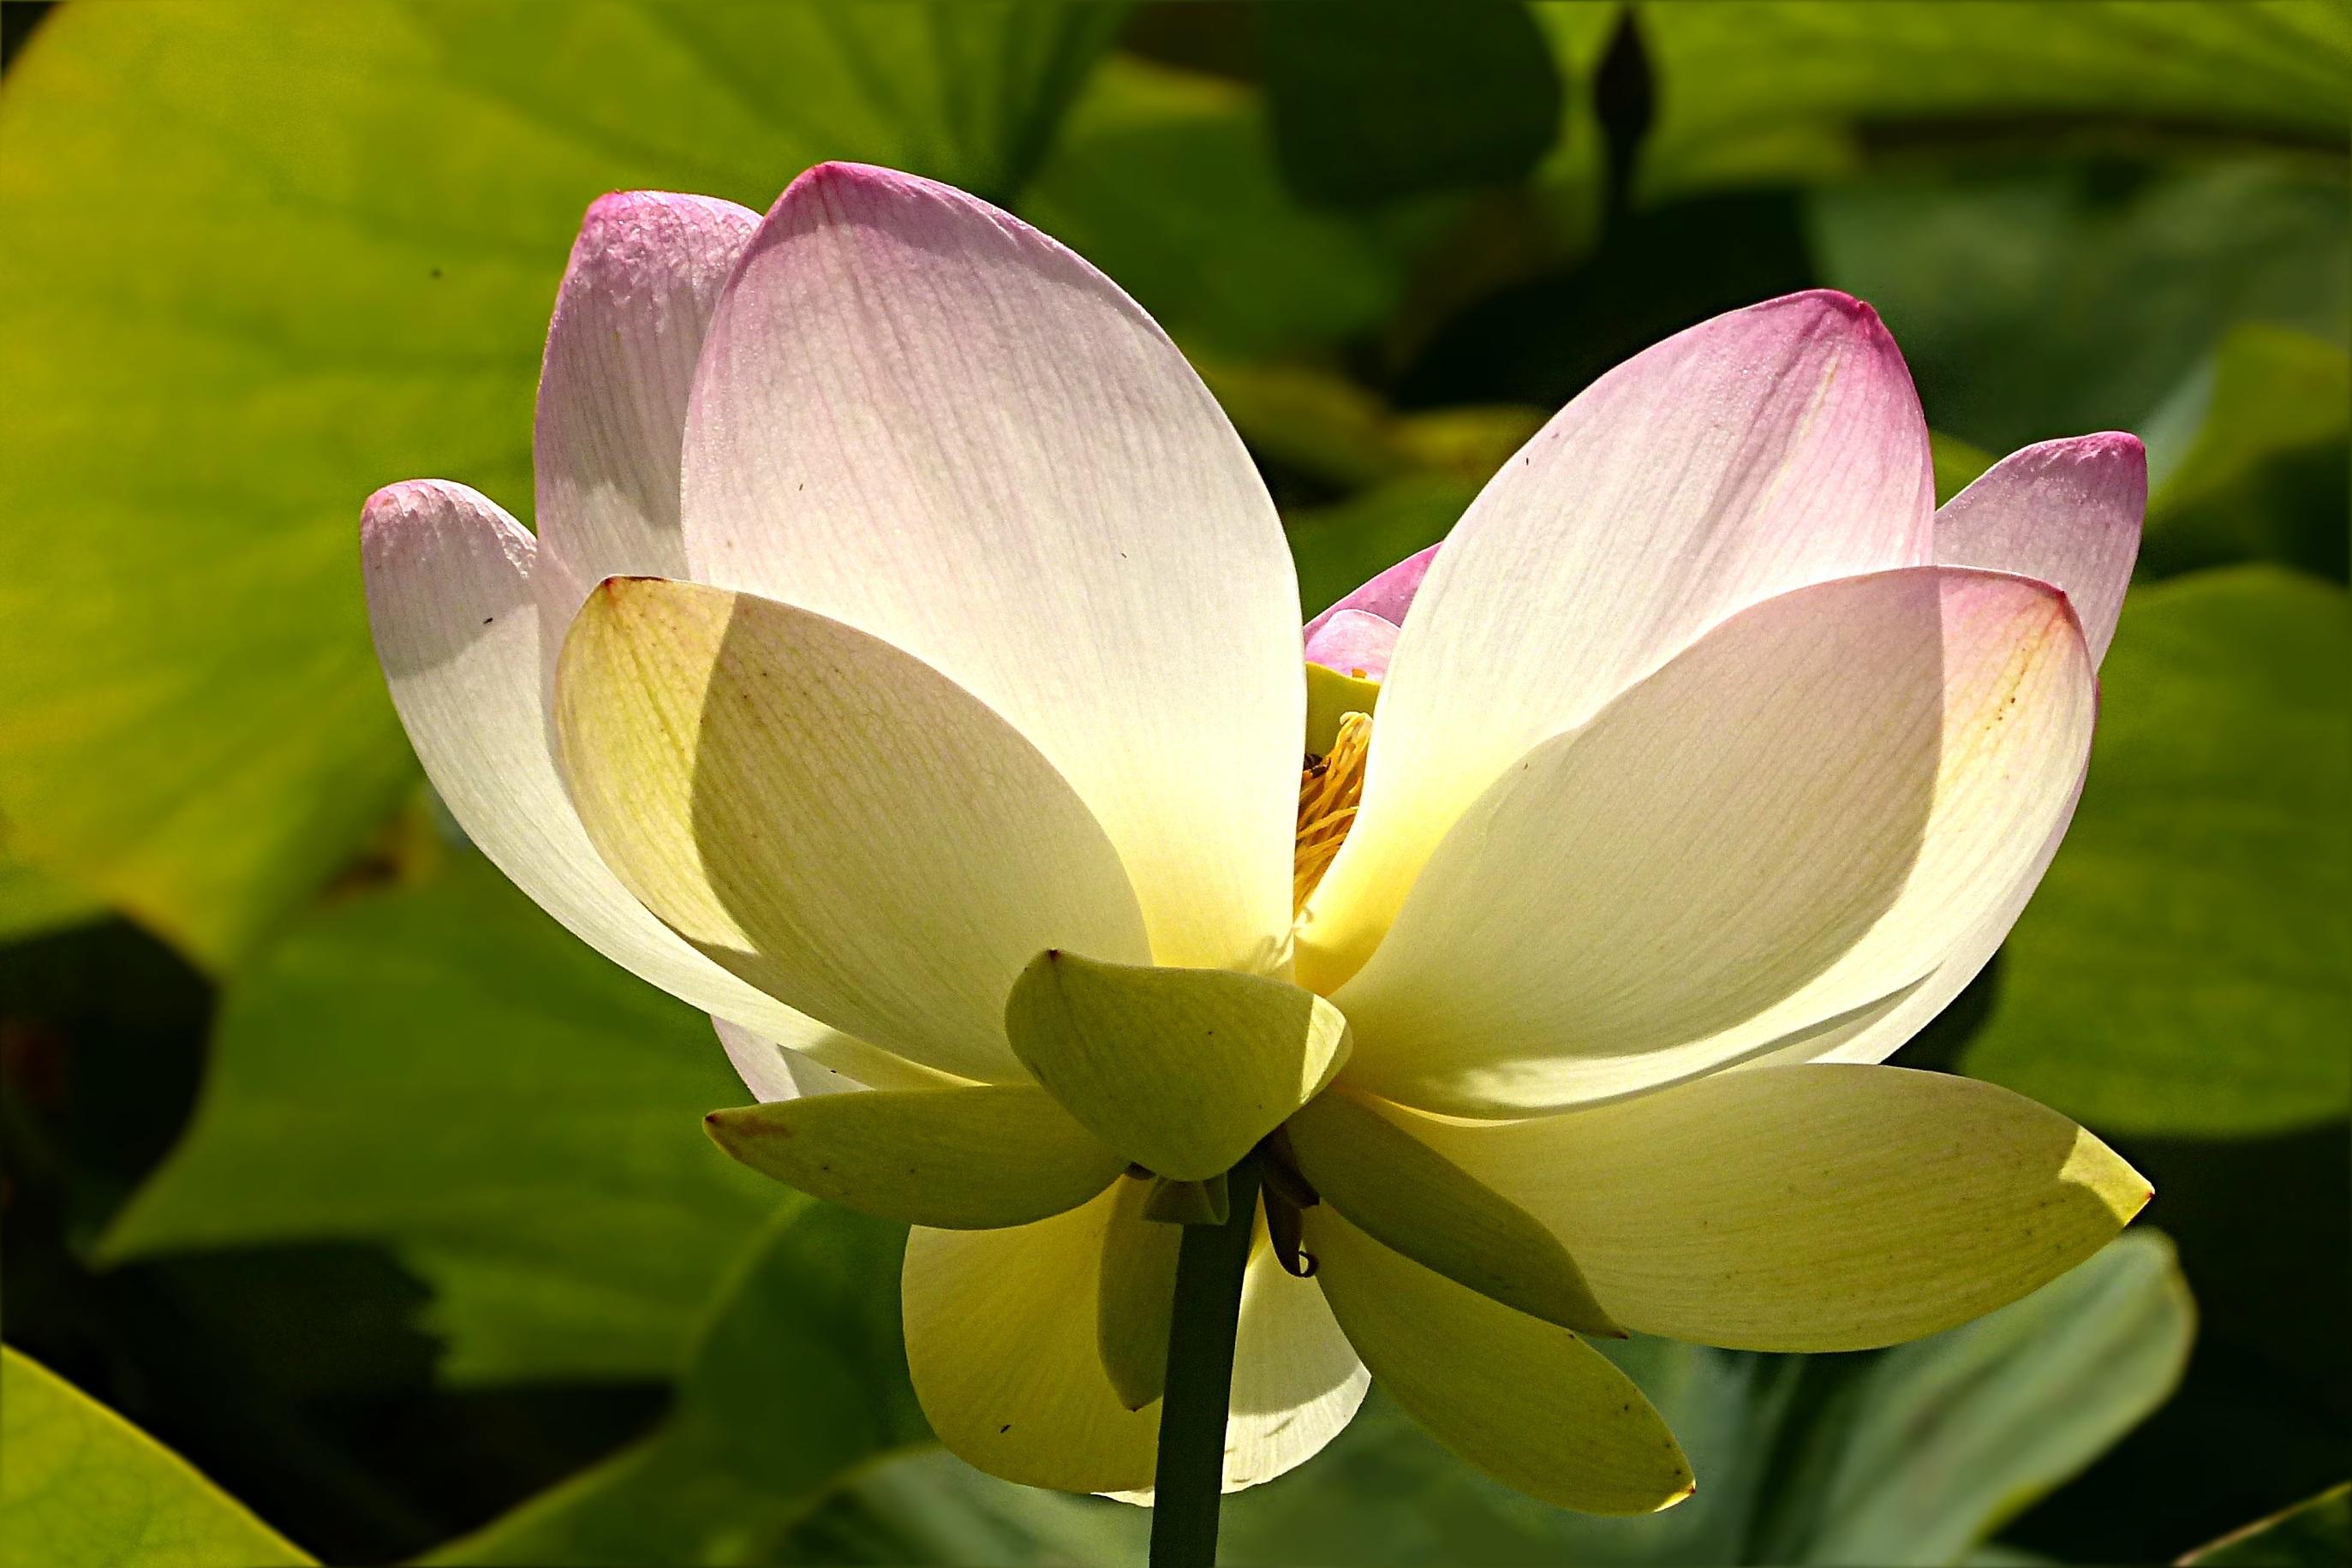 Free Images Blossom Petal Botany Yellow Sacred Lotus Aquatic